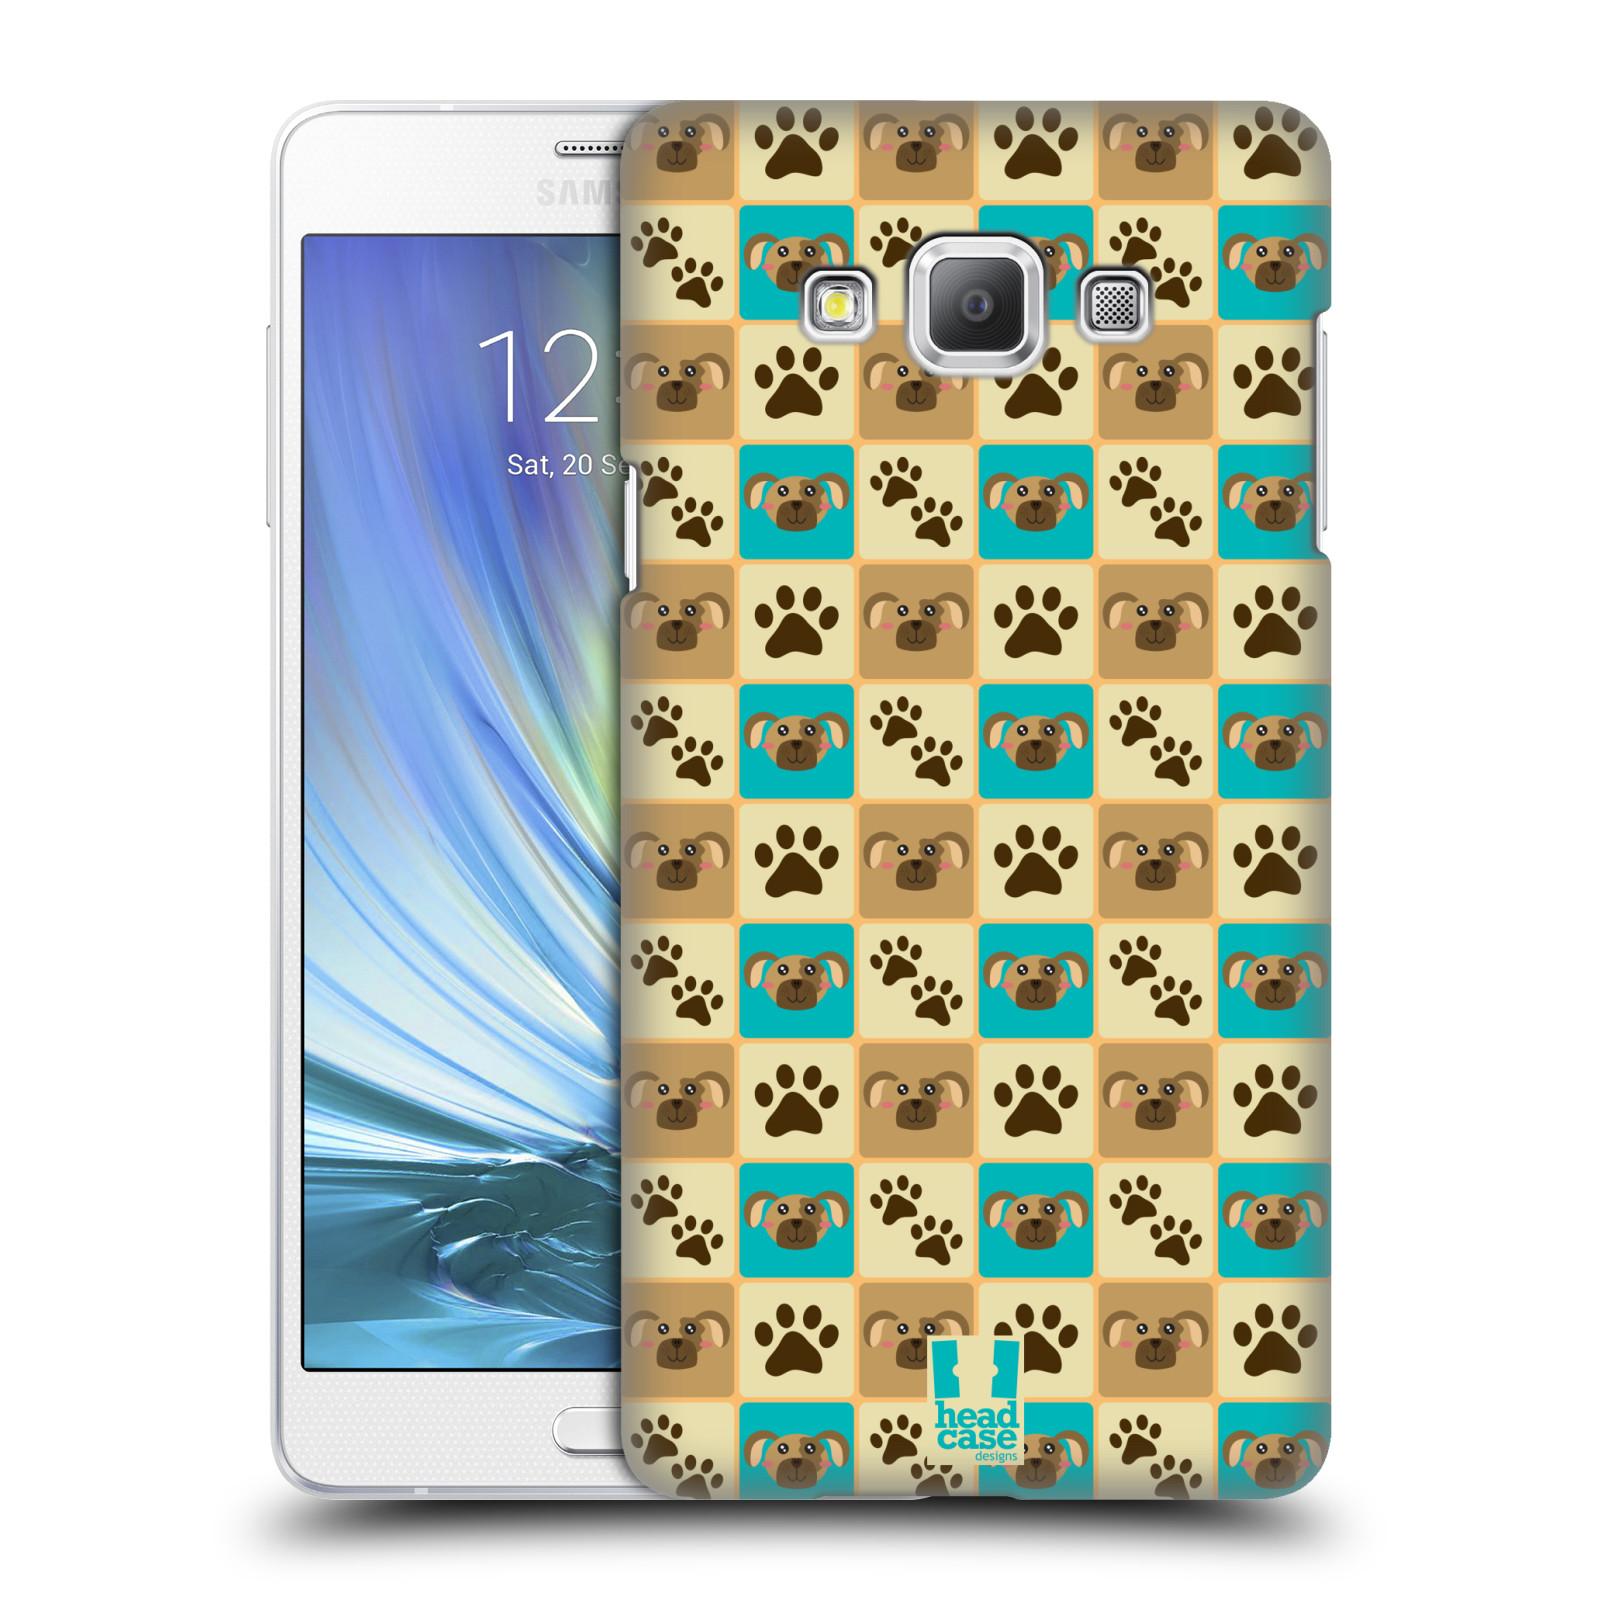 HEAD CASE plastový obal na mobil SAMSUNG GALAXY A7 vzor Zvířecí razítka PSÍ TLAPKA